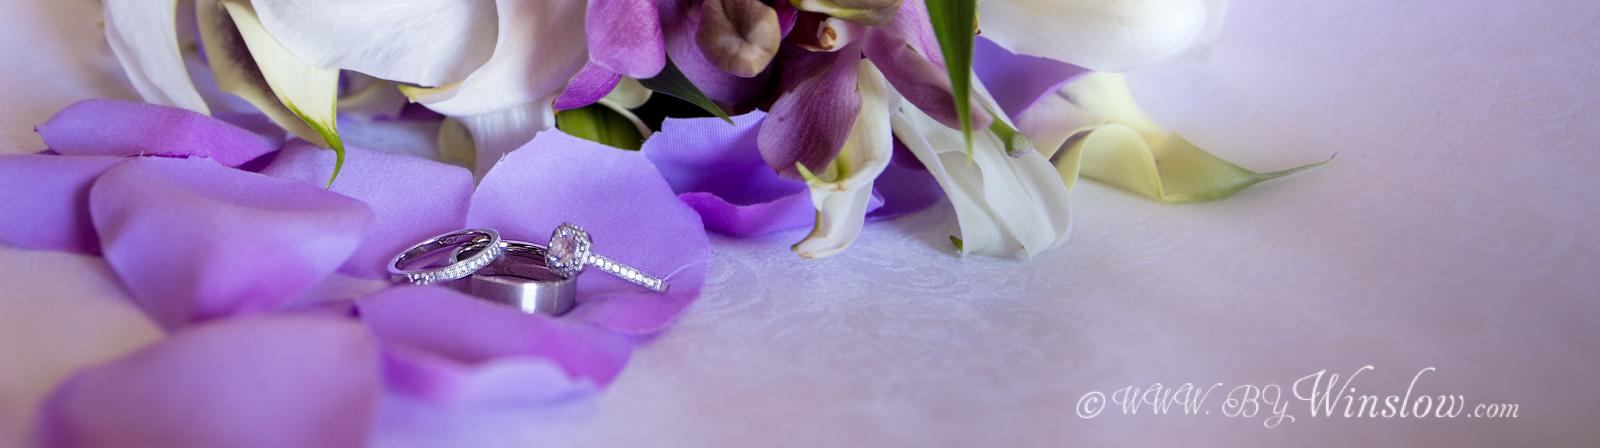 Garret Winslow- bywinslow.com Galleries130903-G8W_6298-Edit-Purple-Rings-16x4